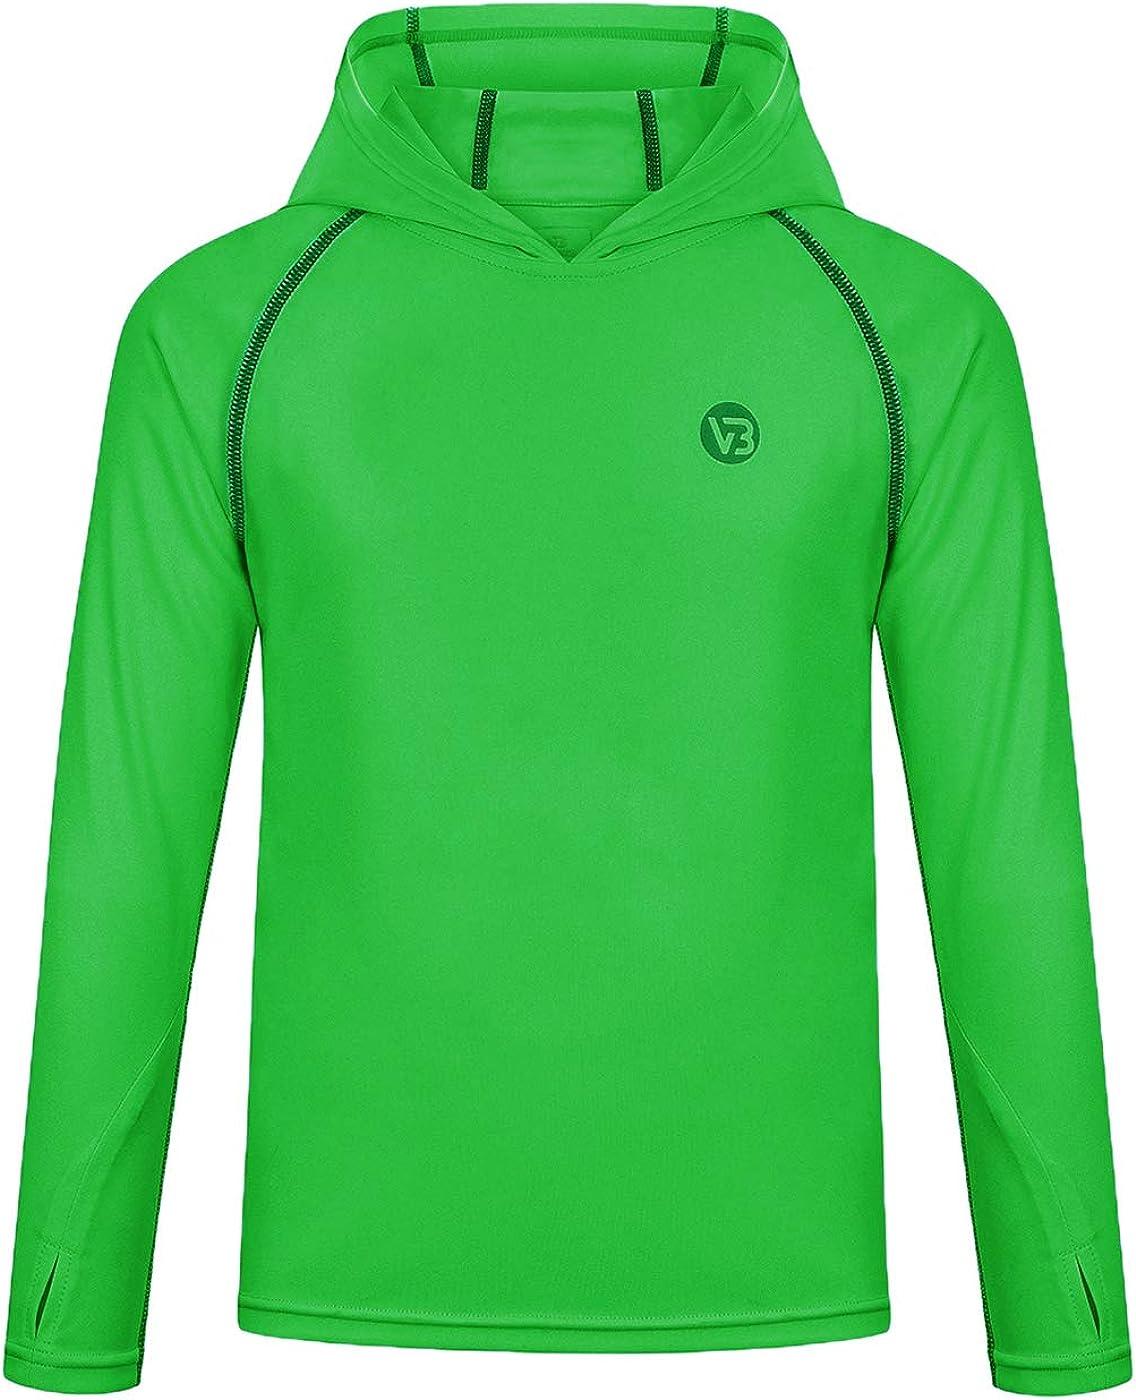 Sun Shirts Rashguard Quick Dry Long Sleeve Hoodies T-Shirts for Workout Thumbholes VEOBIKE Youth UPF50